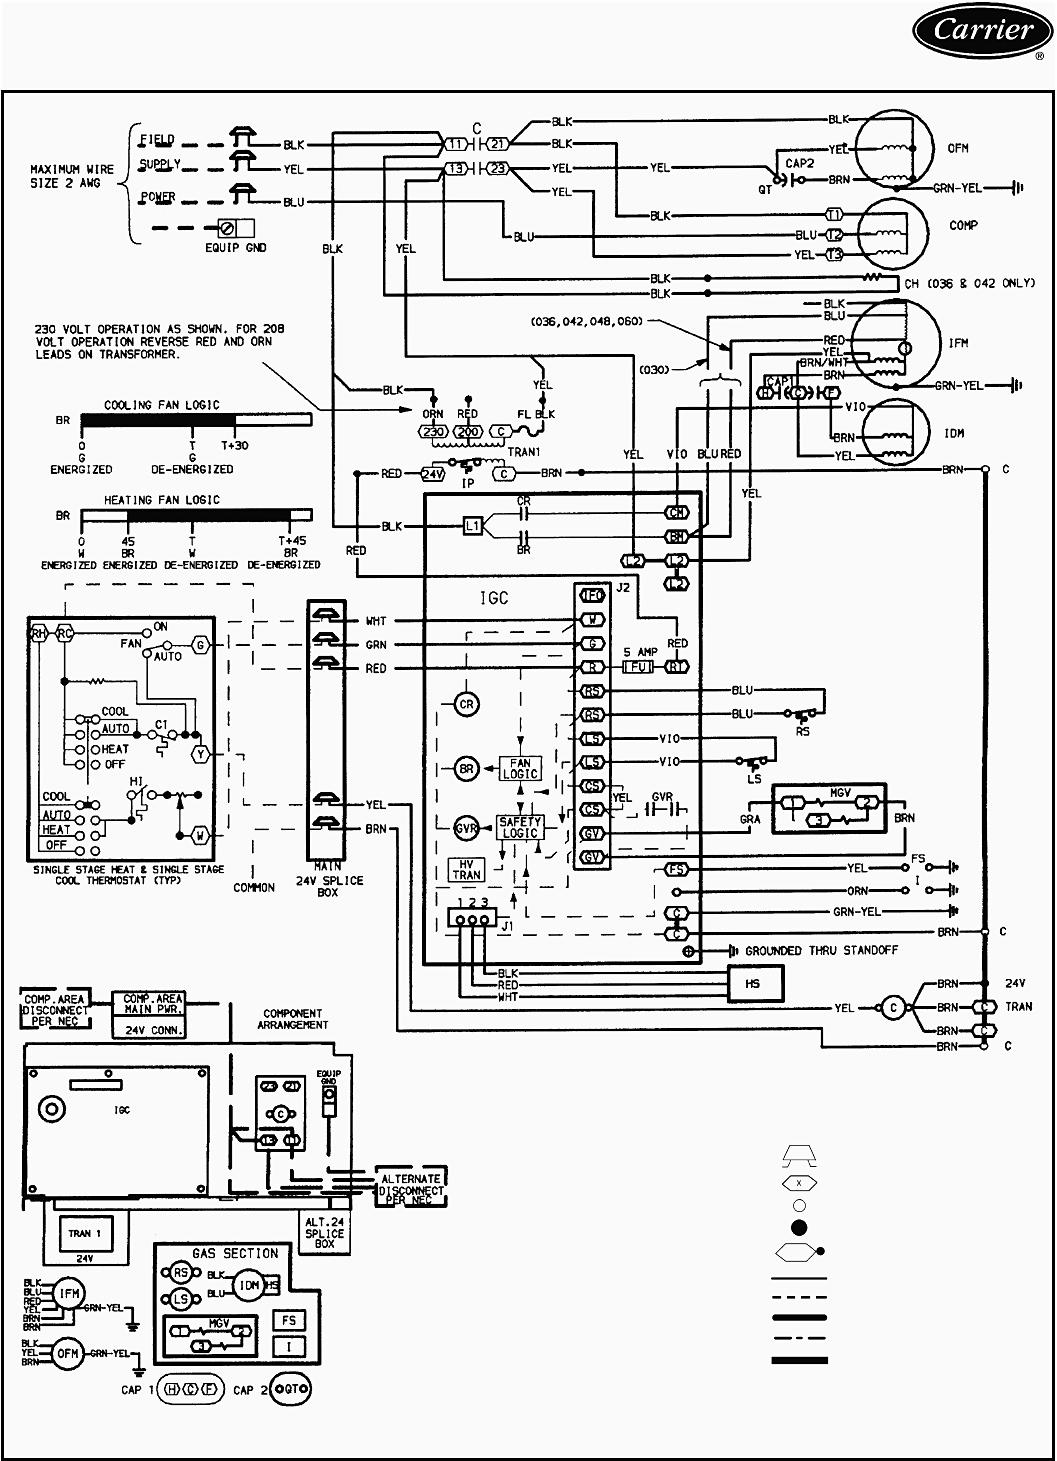 DIAGRAM] Atwood 8531 Wiring Diagram FULL Version HD Quality Wiring Diagram  - THEDIAGRAMGURU.BANDBANNAMARIA.IT | Hydro Flame Furnace Wiring Diagram |  | Diagram Database - bandbannamaria.it